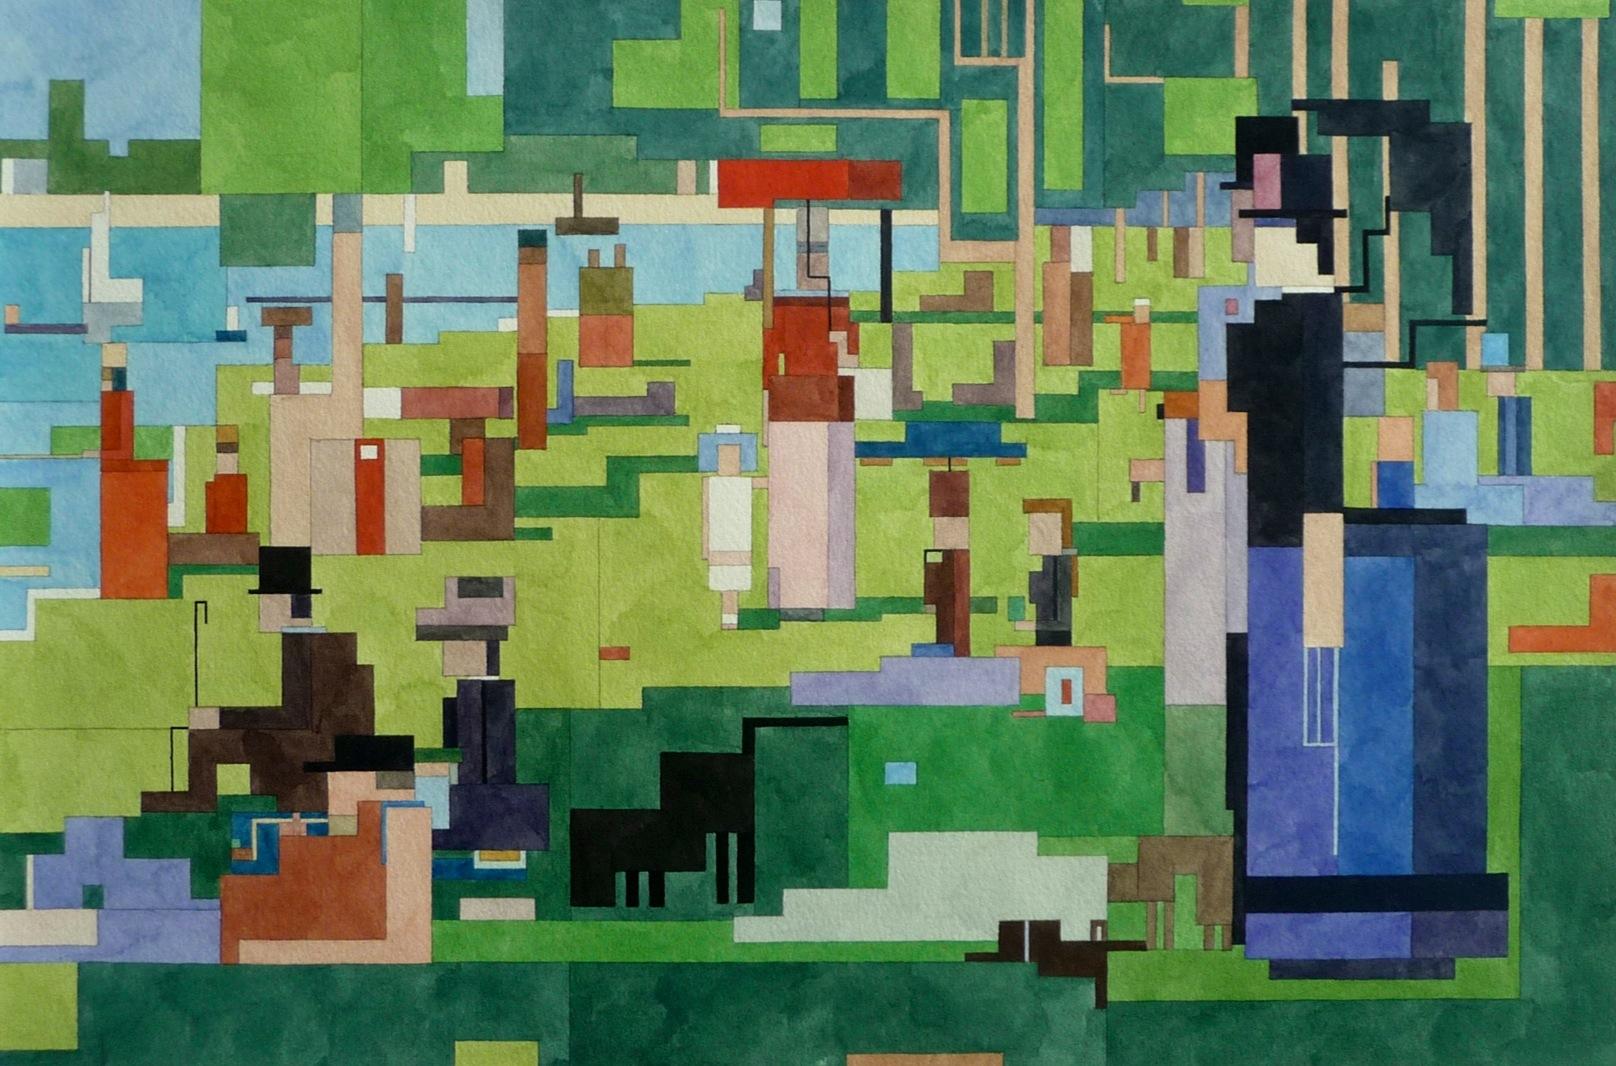 cube-7.jpg